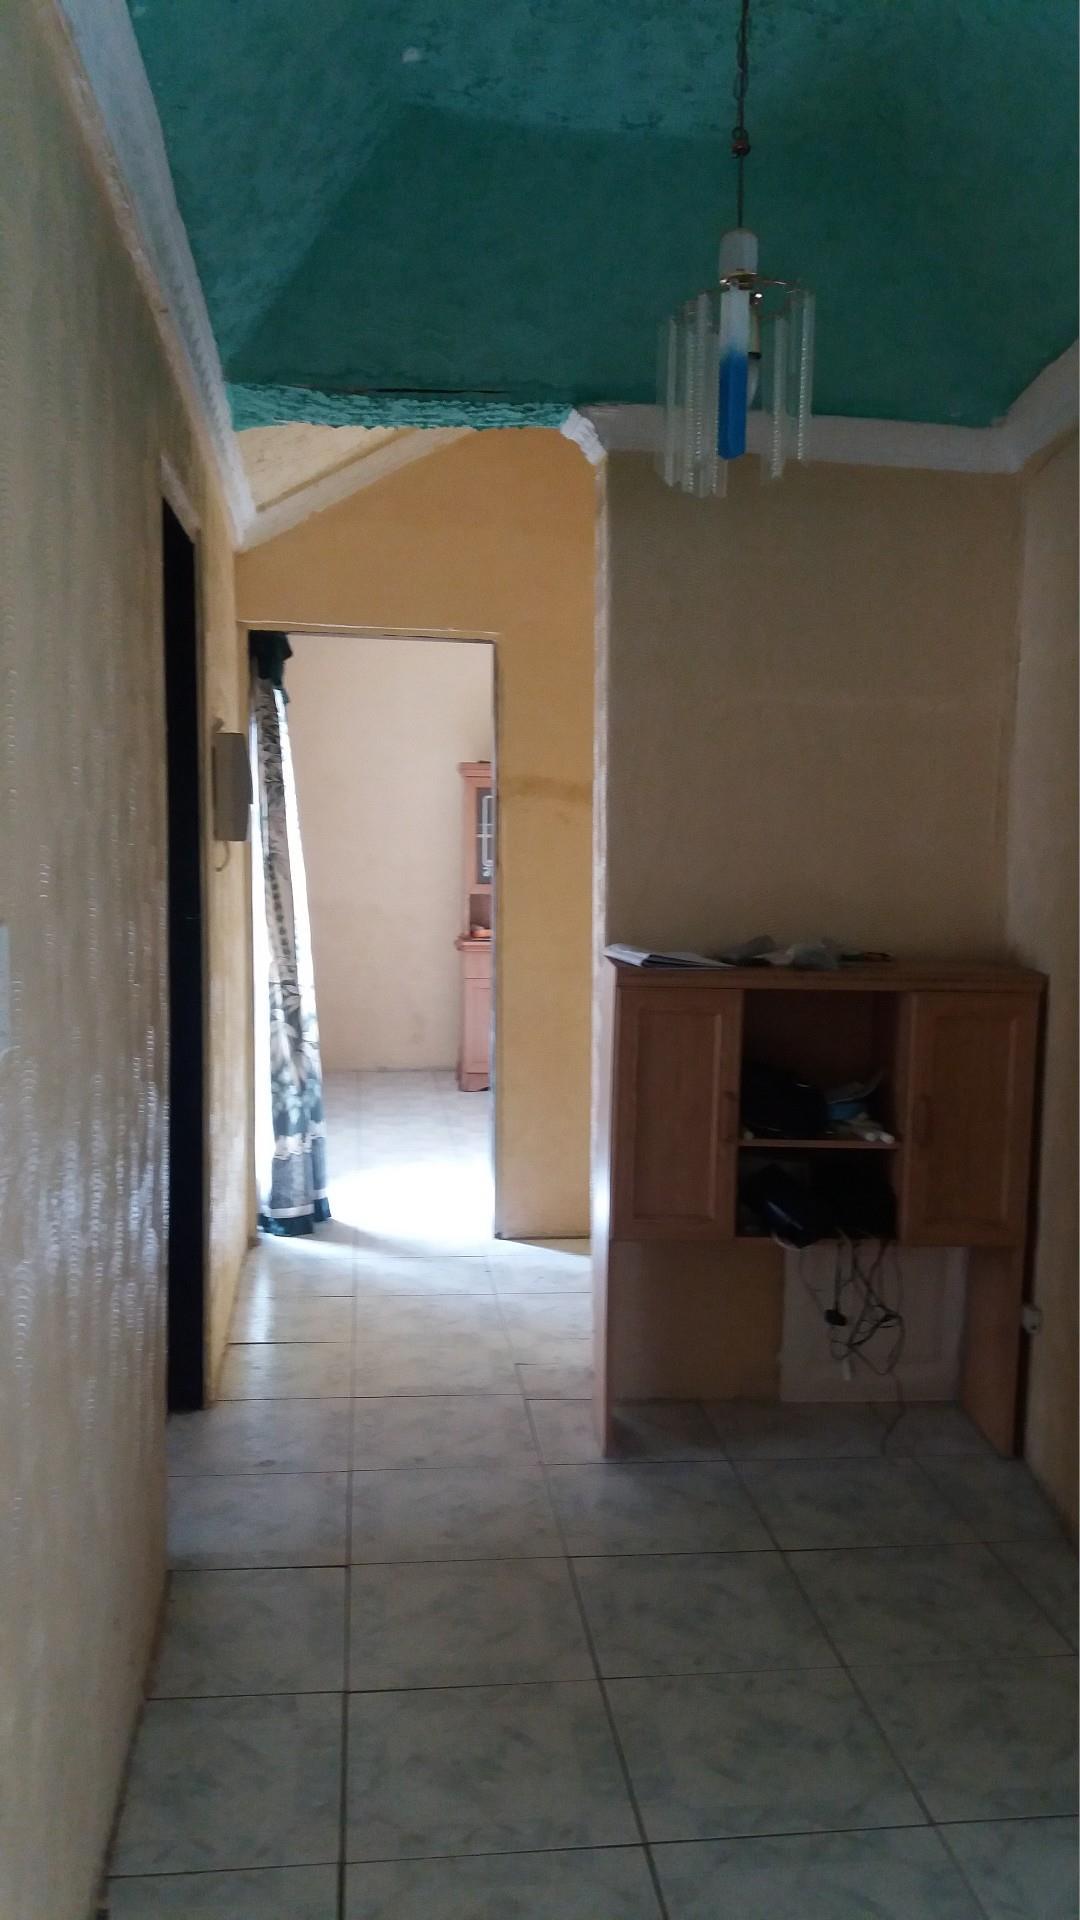 4 Bedroom House For Sale in Louis Trichardt